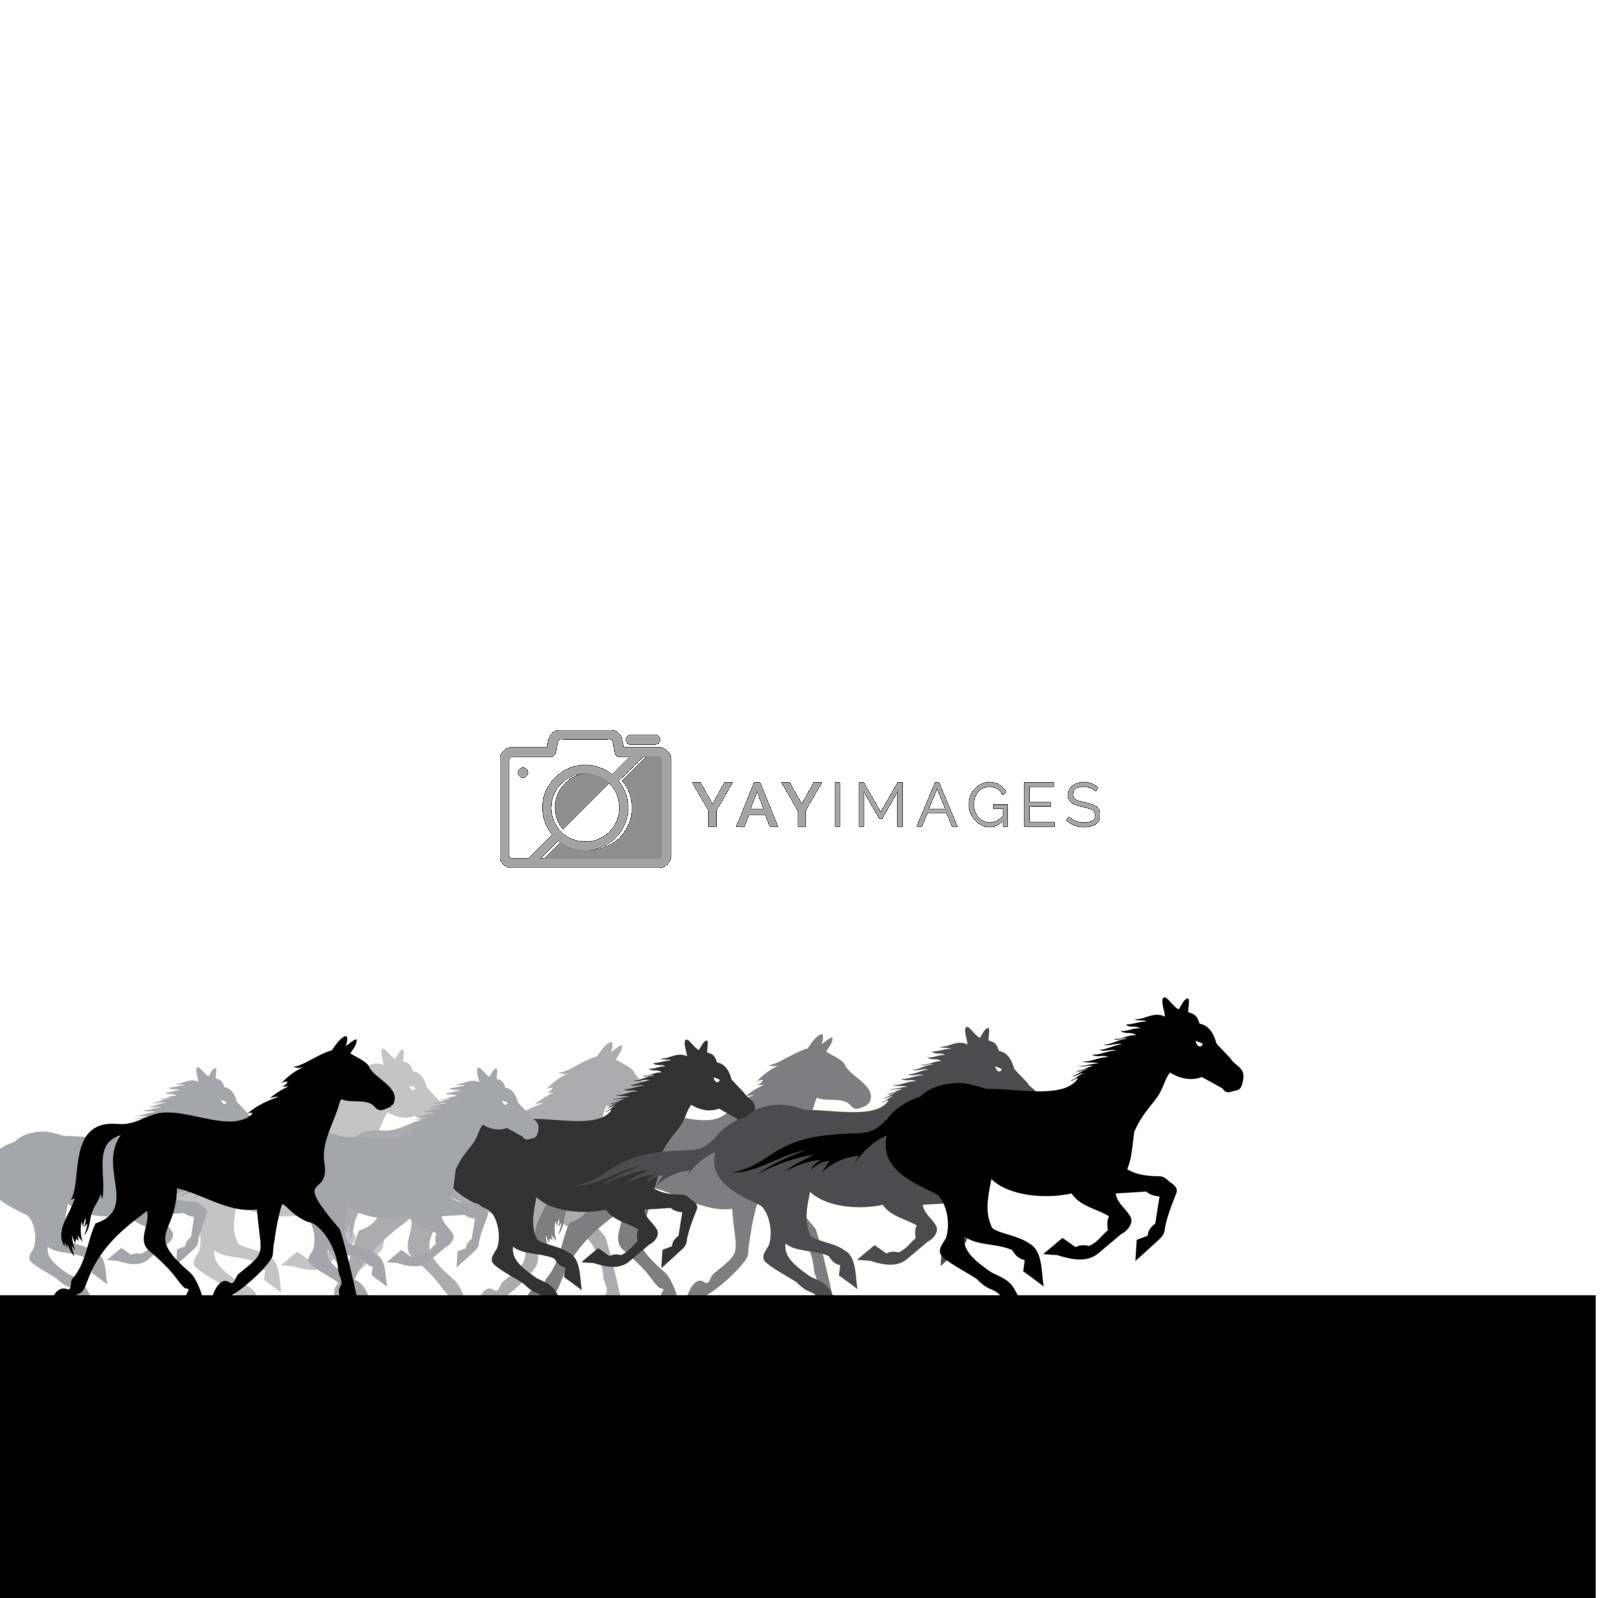 Run of herd of horses across the field. A vector illustration